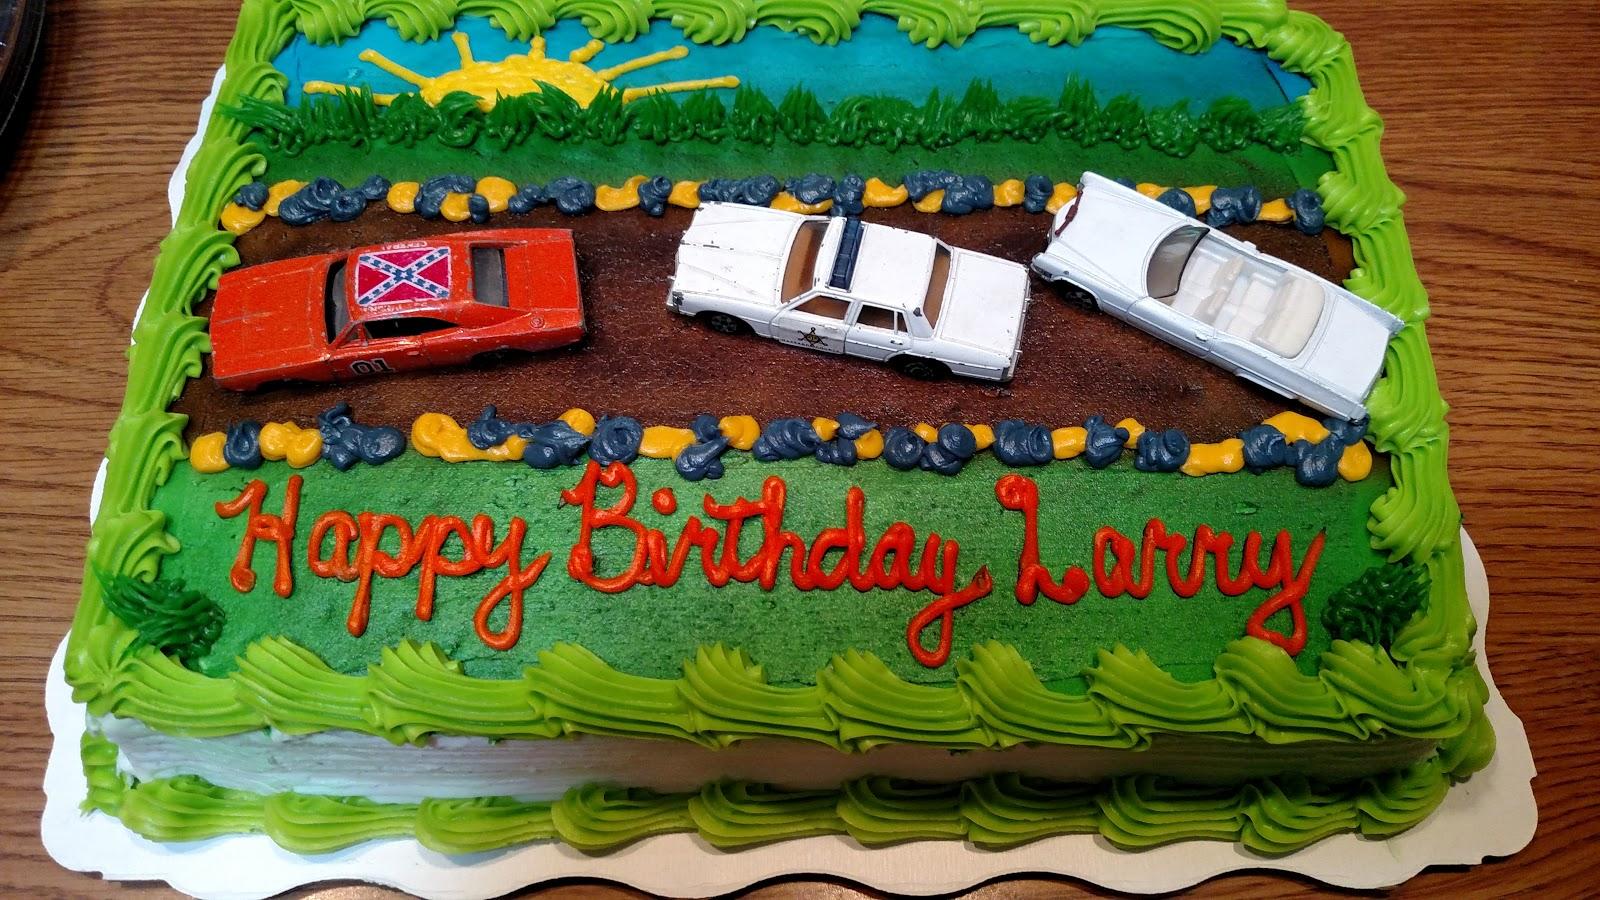 Dukes Of Hazzard Collector Happy Birthday